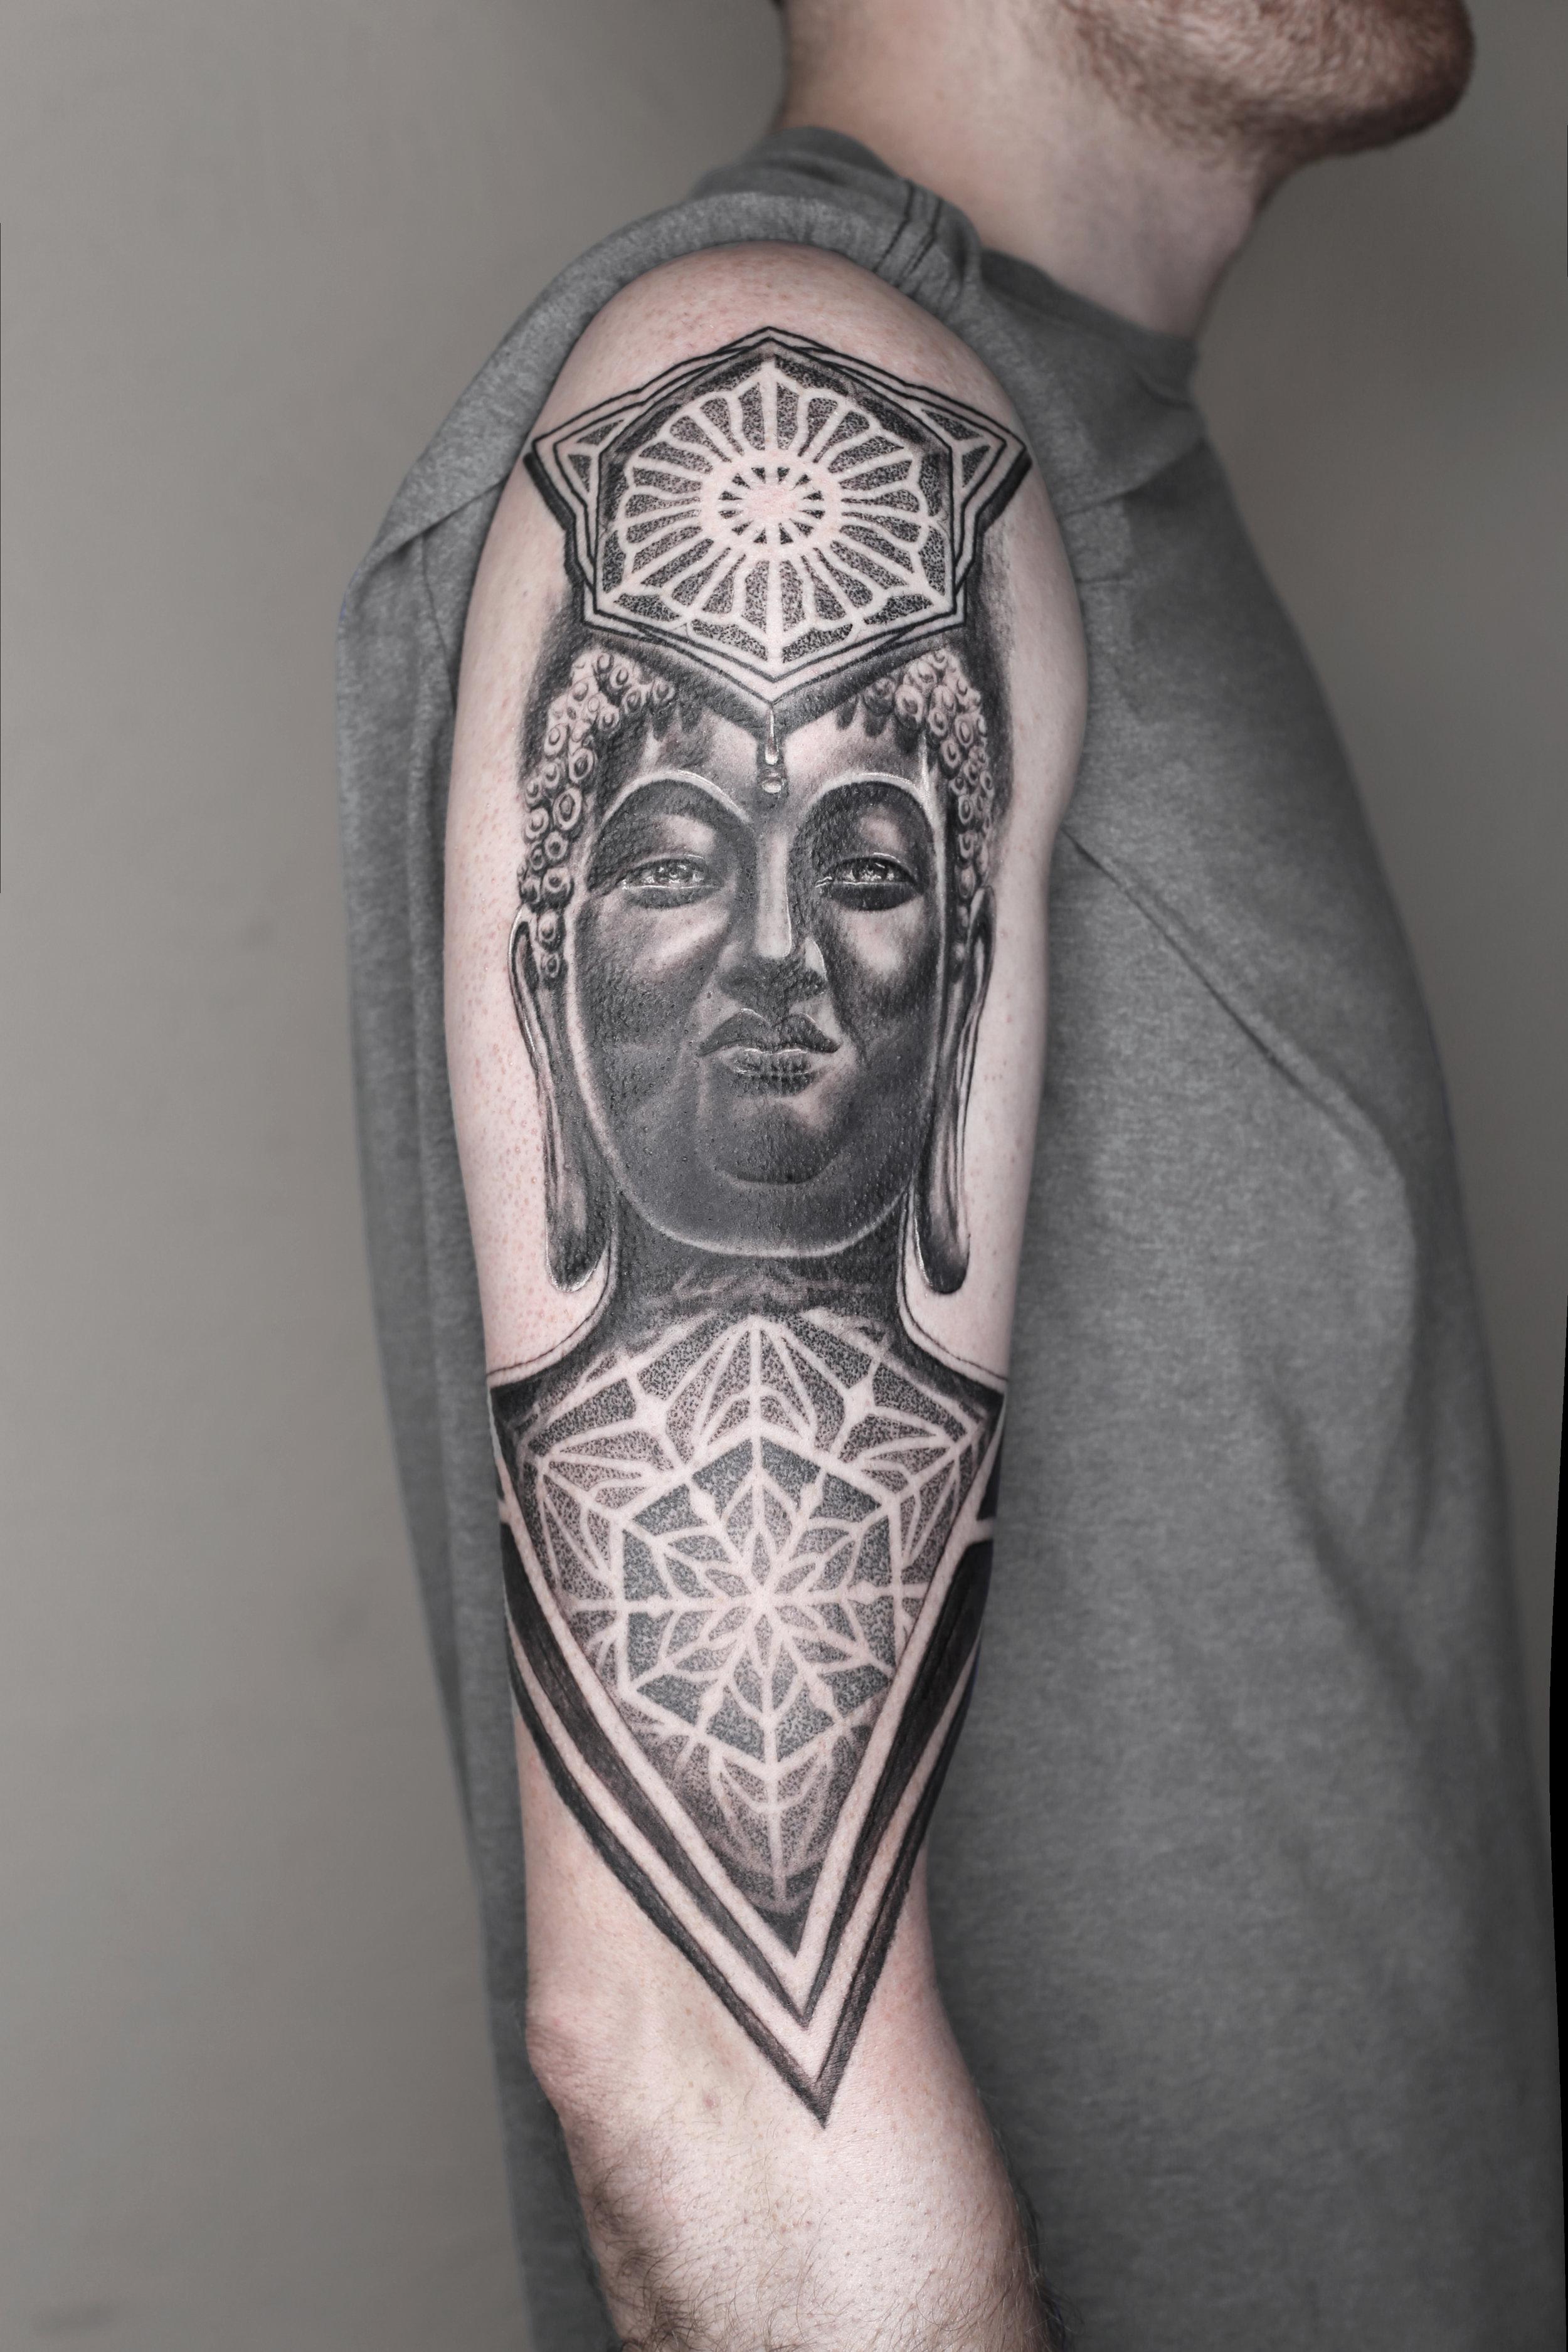 buddah ejay tattoo dalls texas singleton tattoo ink master ink angel thomas hooper trinity groves .jpg